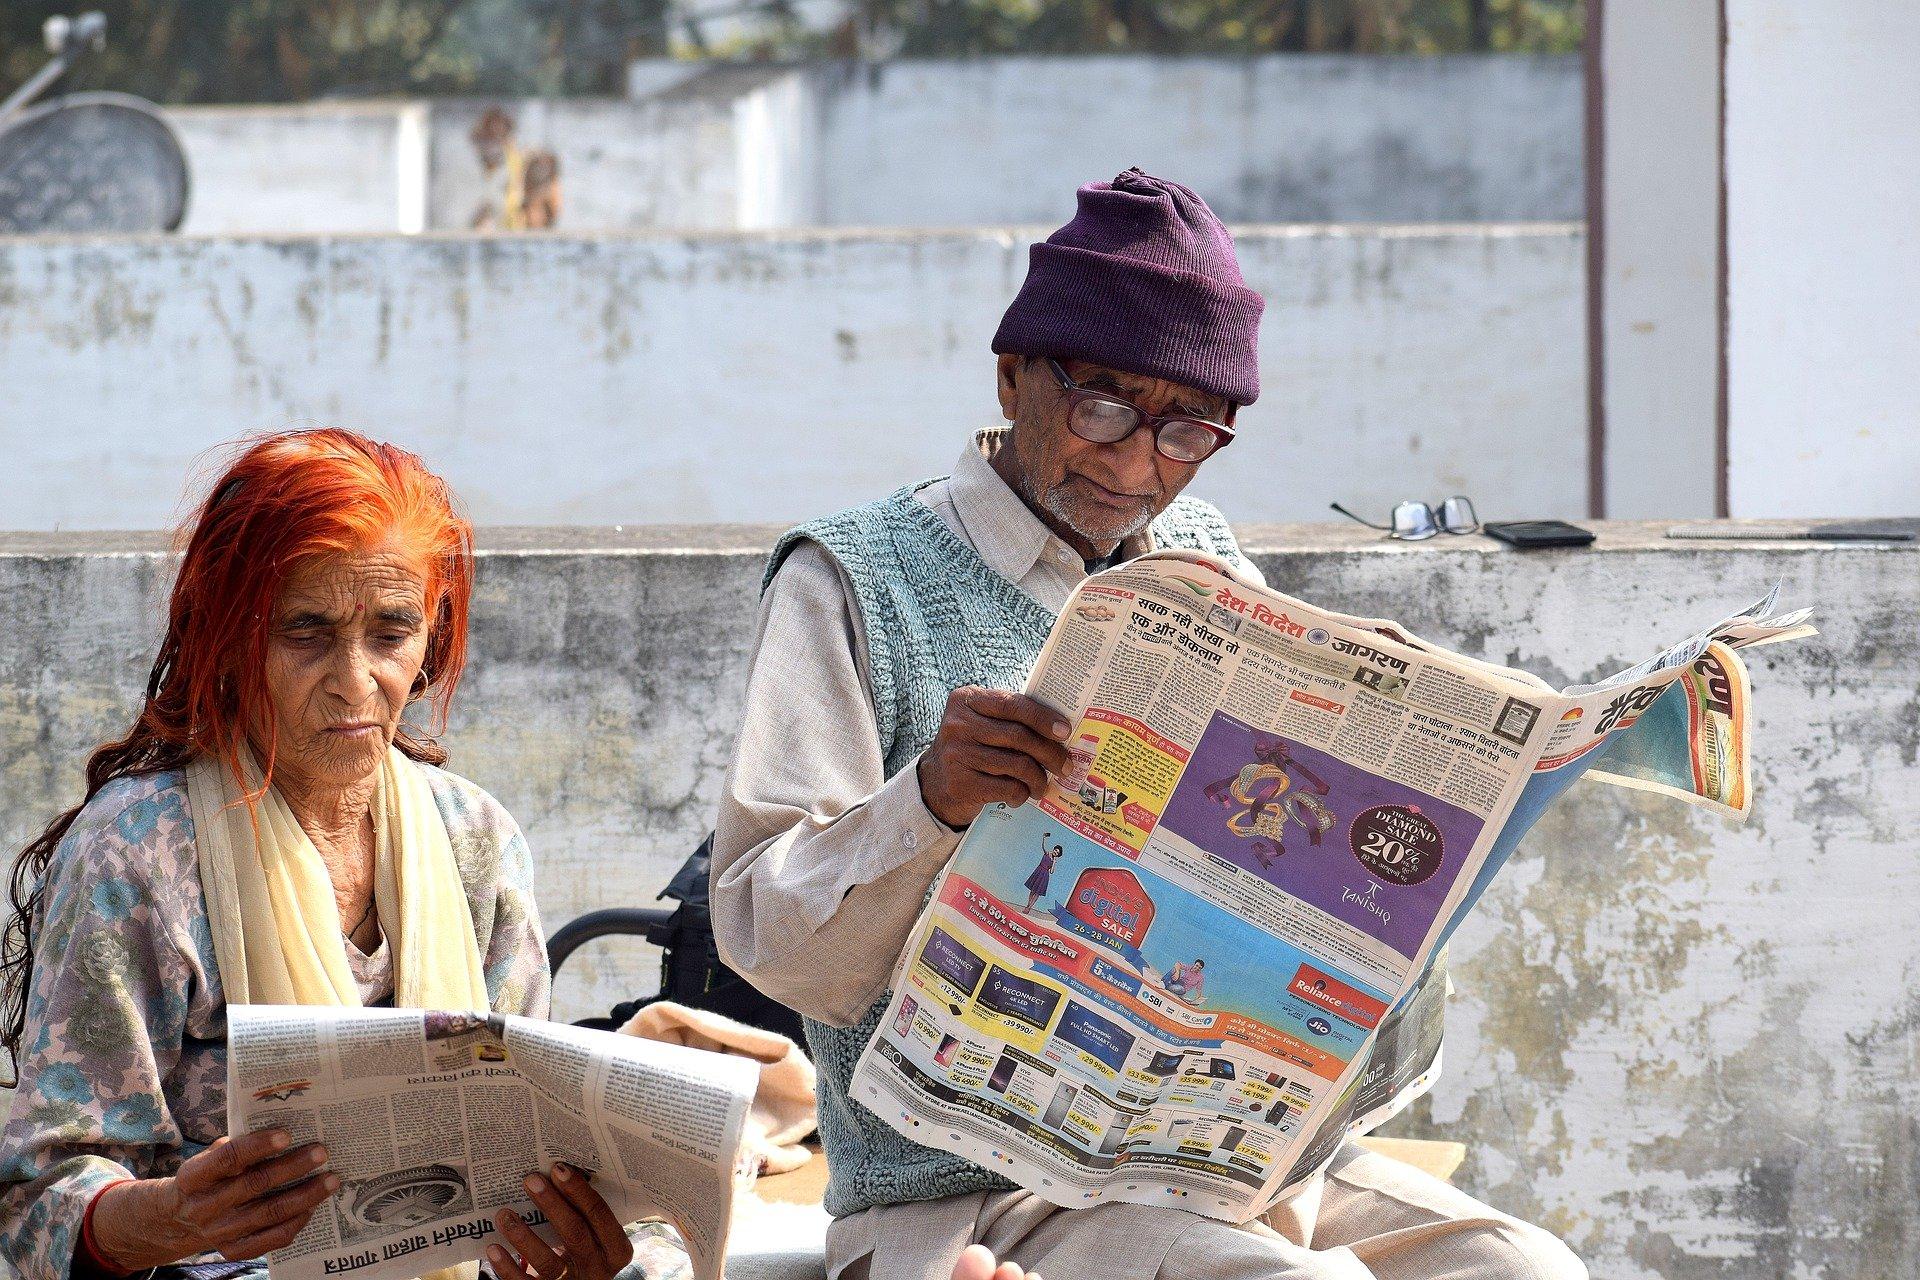 old-couple-5051770_1920.jpg